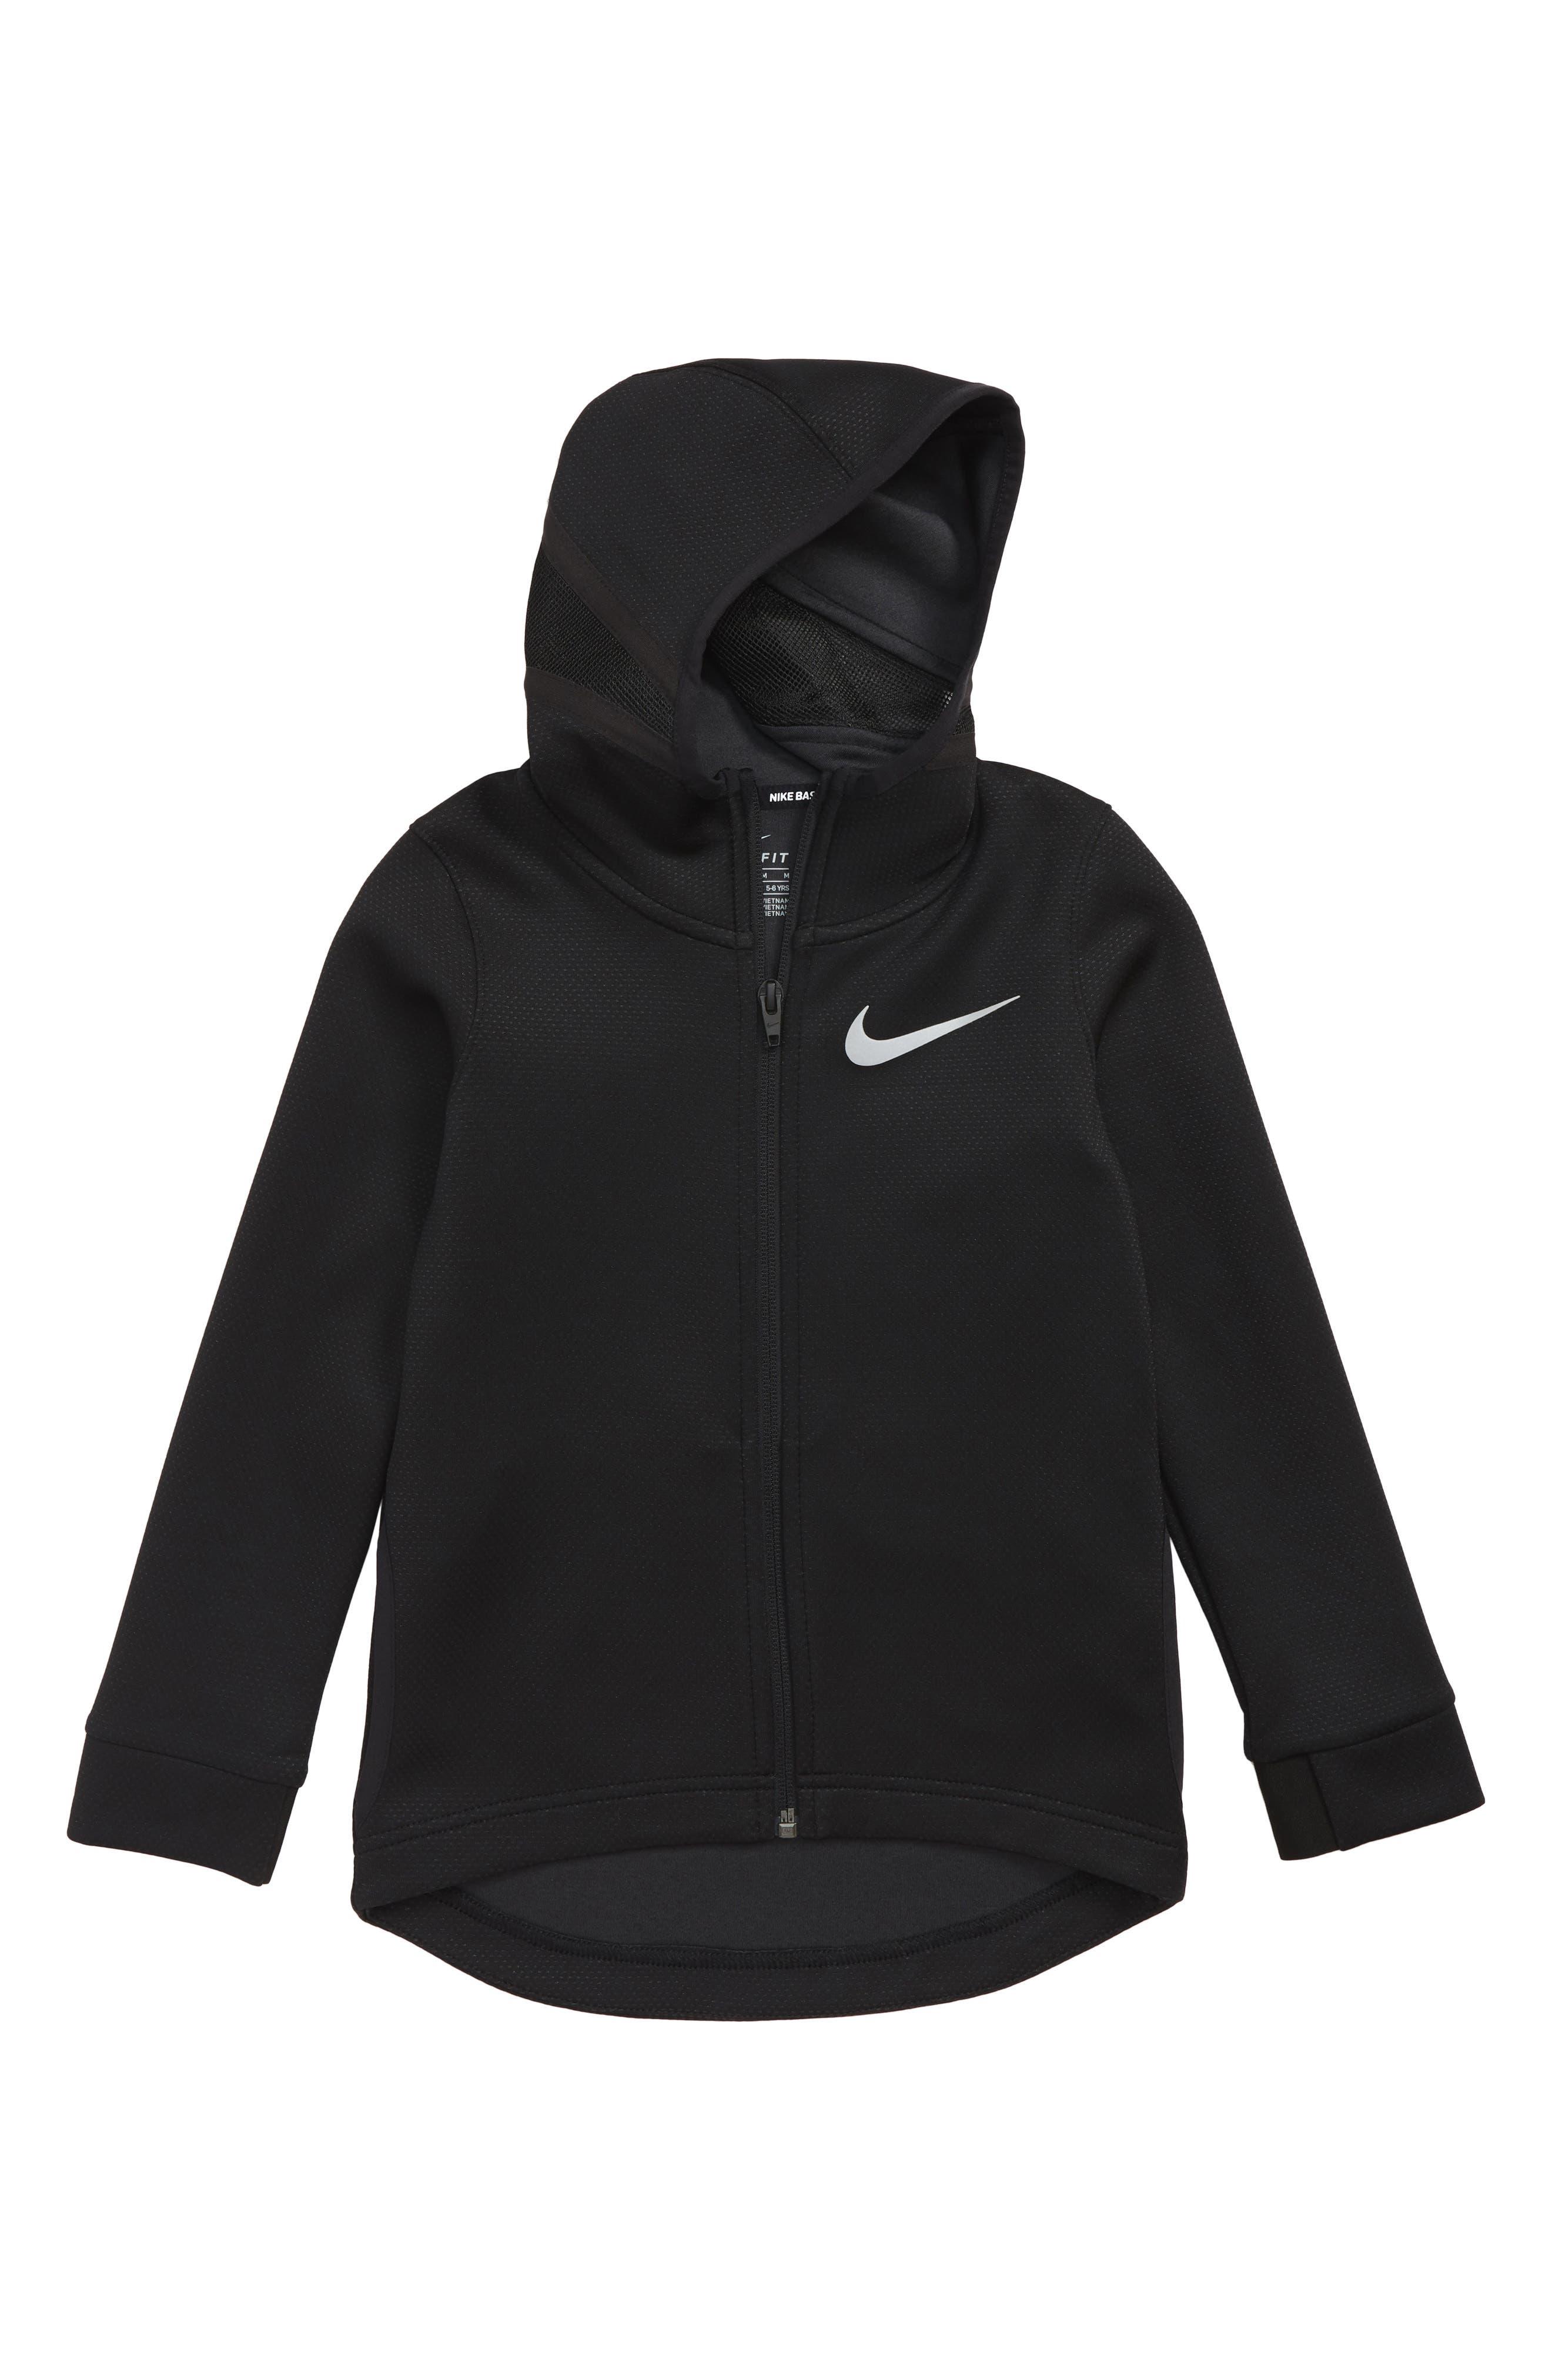 Boys Nike Therma Flex Dry Stretch Basketball Hoodie Size 7  Black